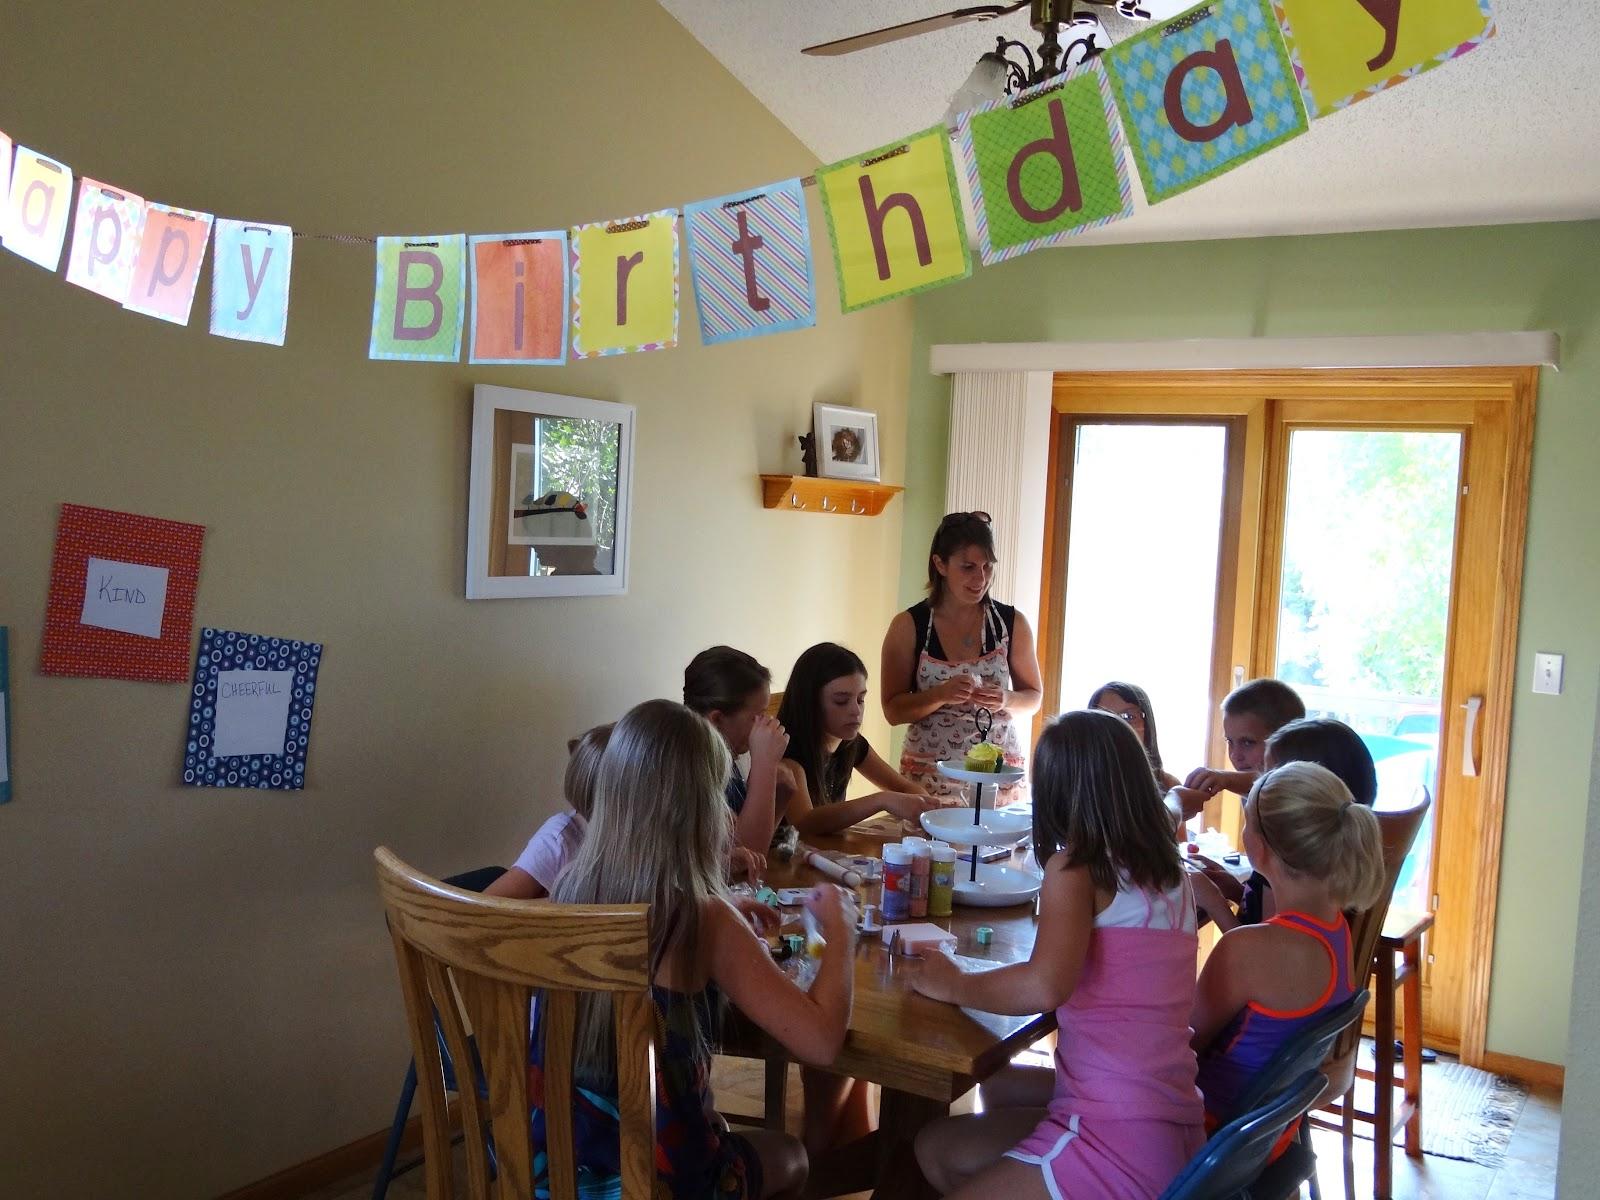 Libbys Cupcakes Etc: Cupcake Decorating Birthday Party